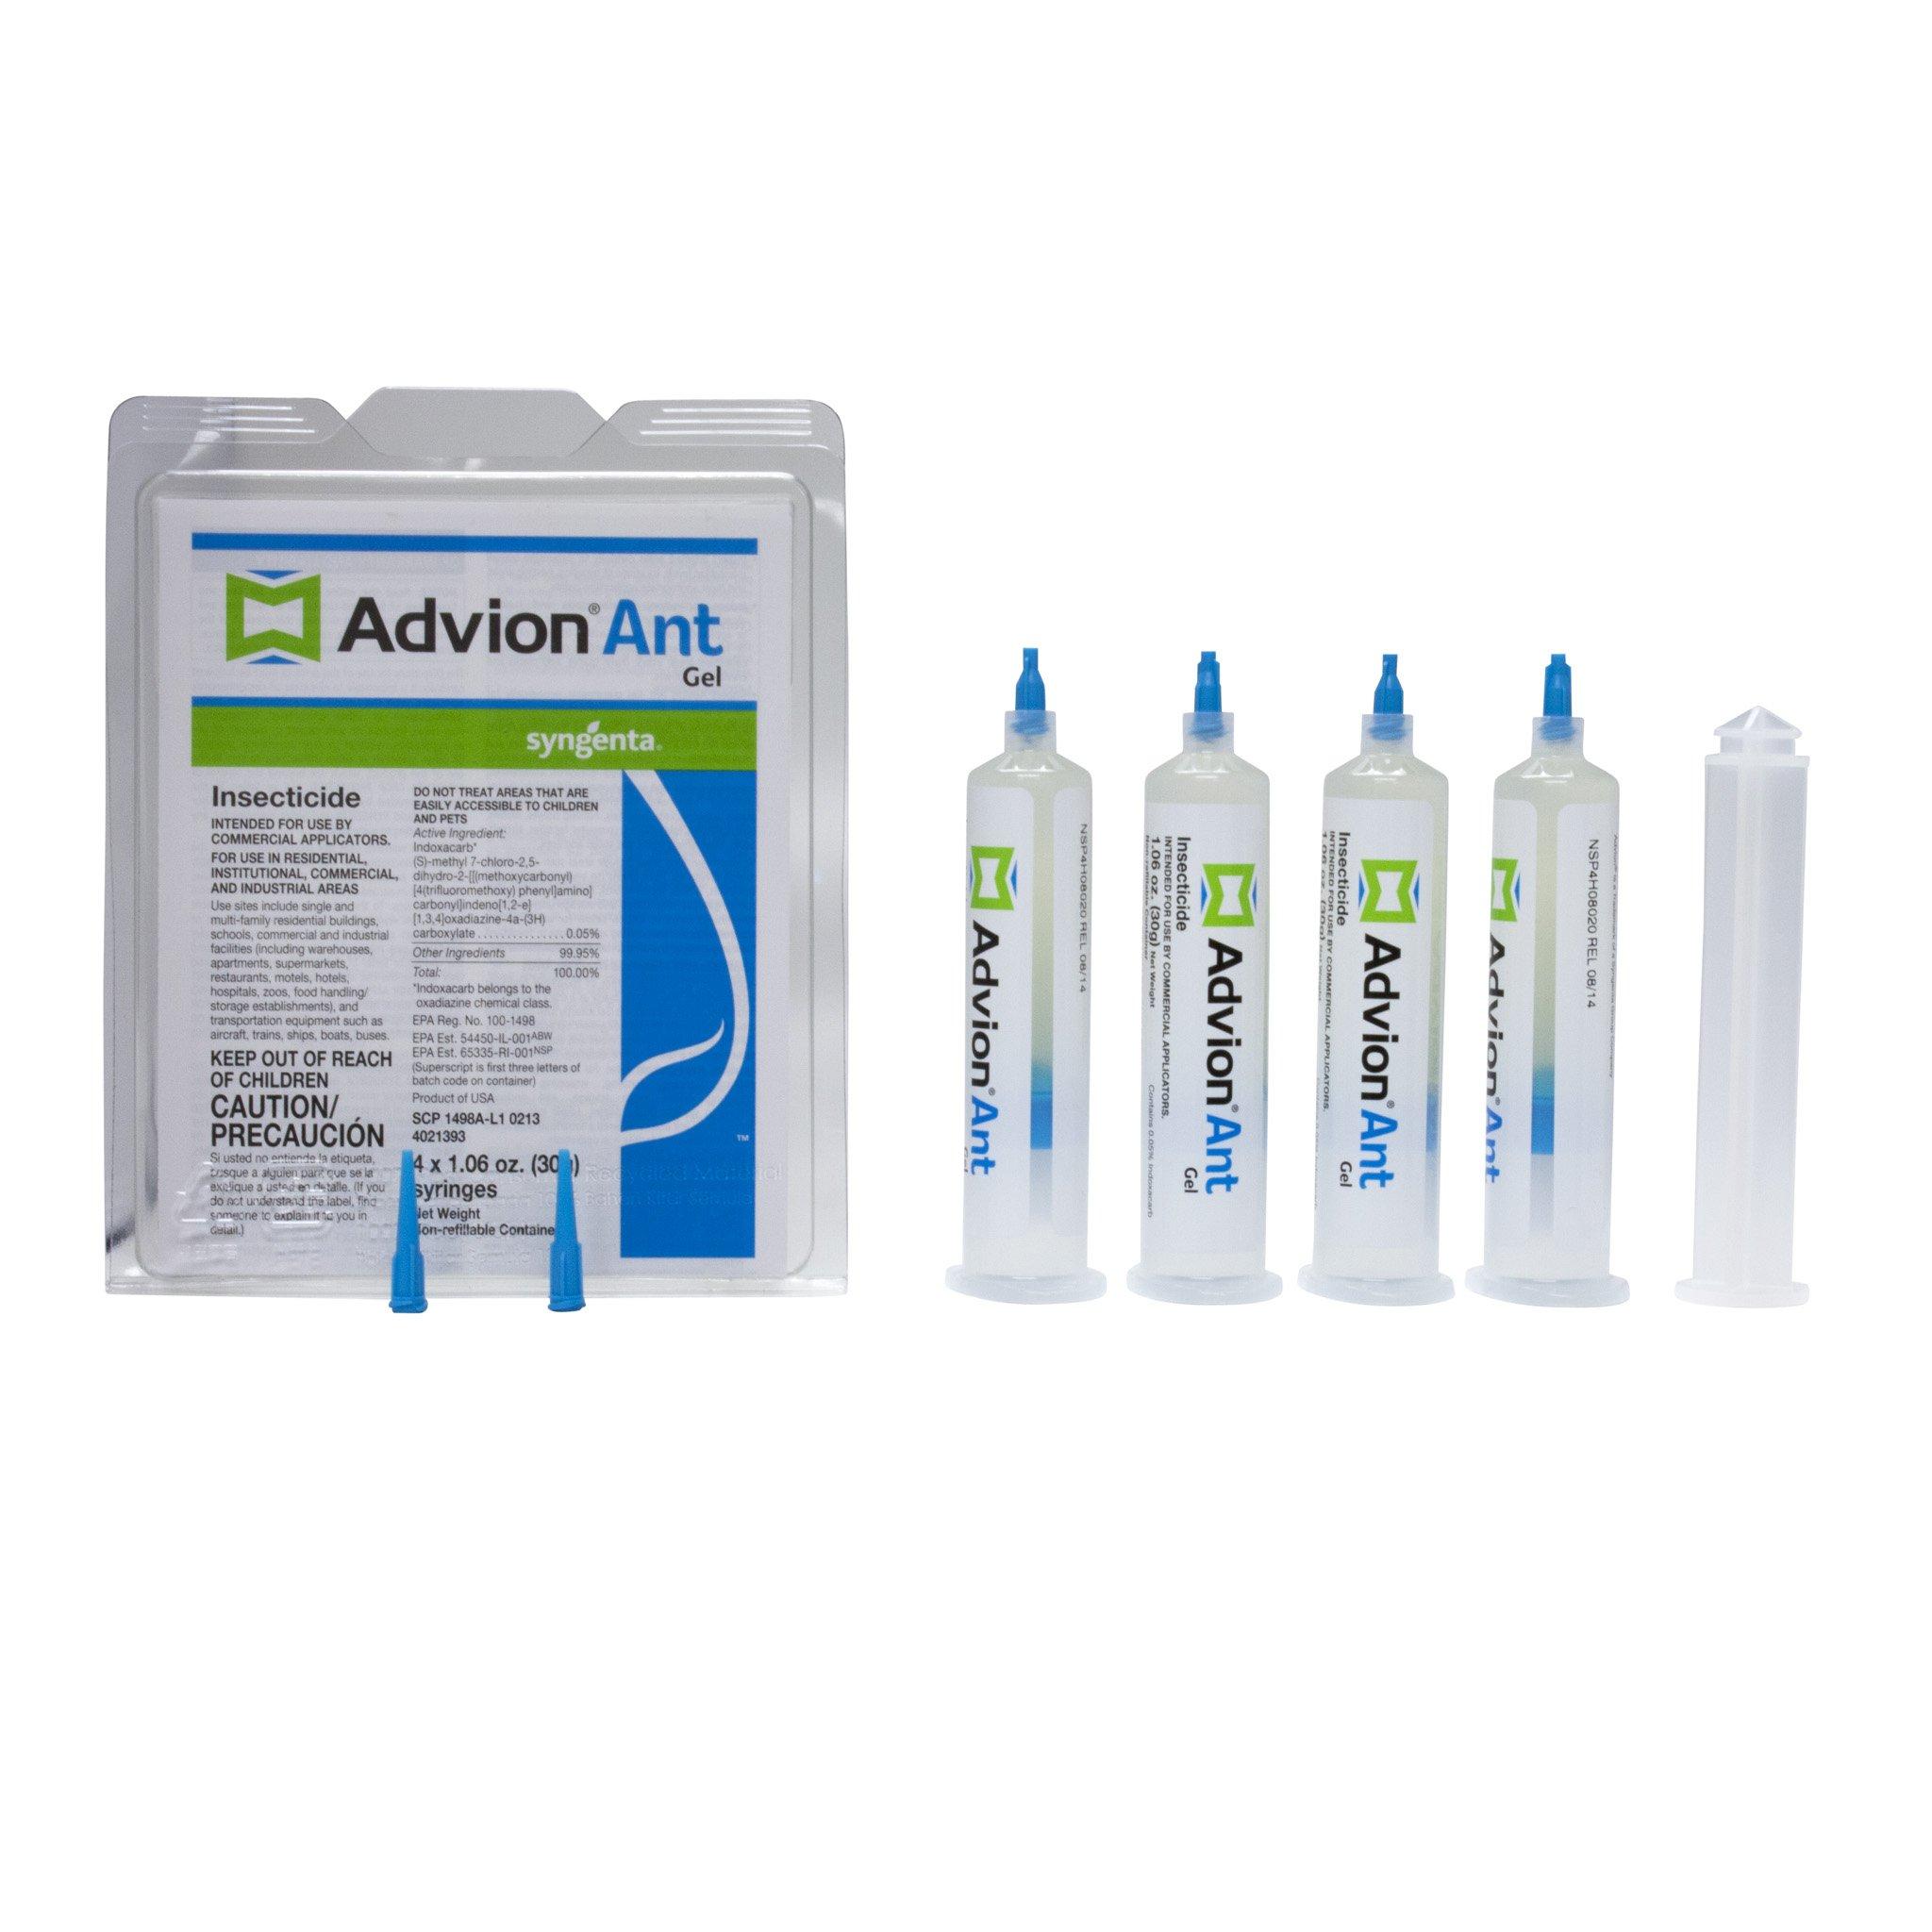 Advion Ant Bait Gel (5 boxes of 4 tubes)